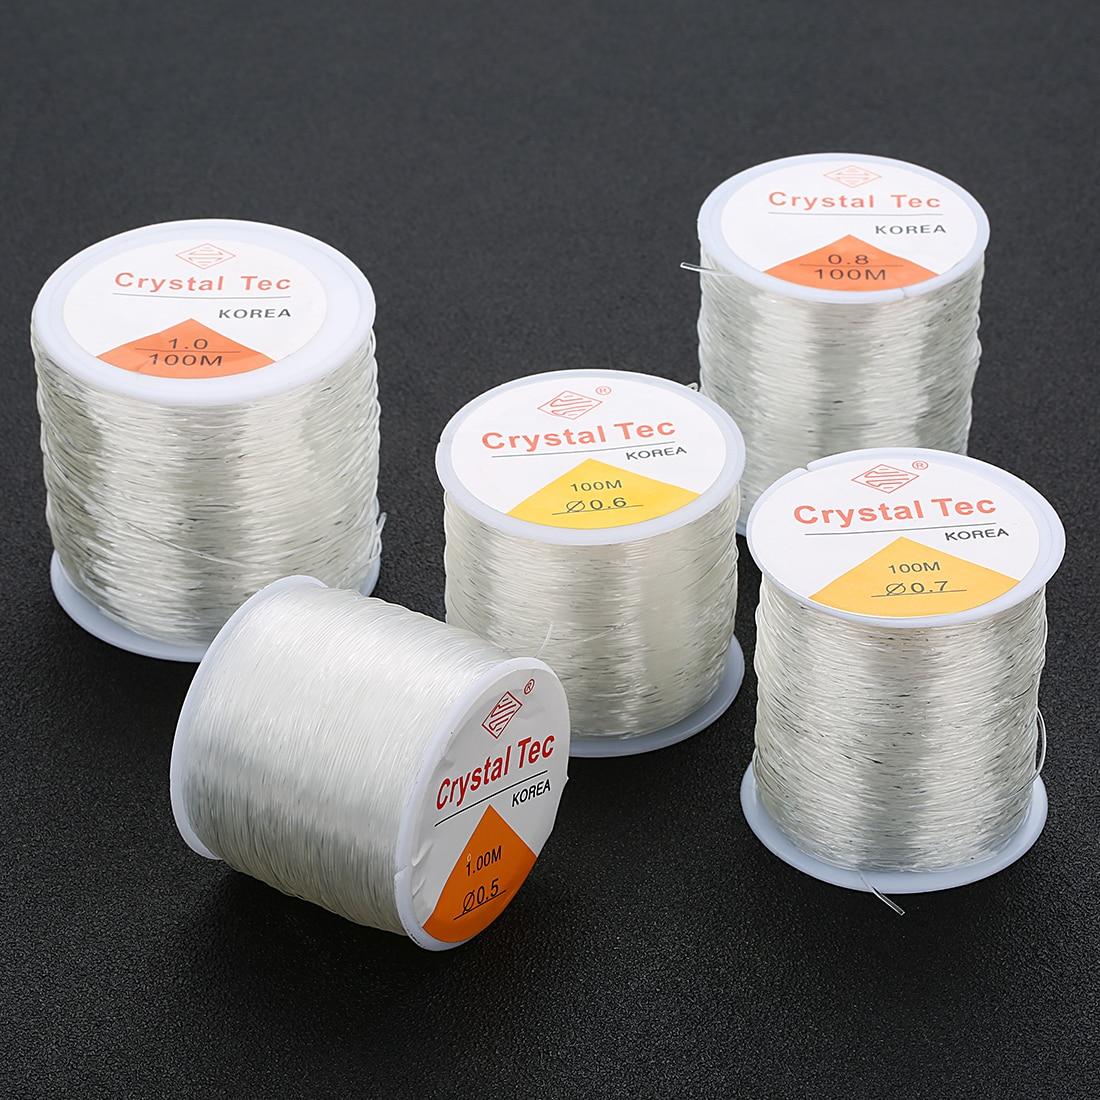 1.2 mm Estiramiento Elástico Transparente Transparente Cristal Tec cadena cordón abalorios Craft